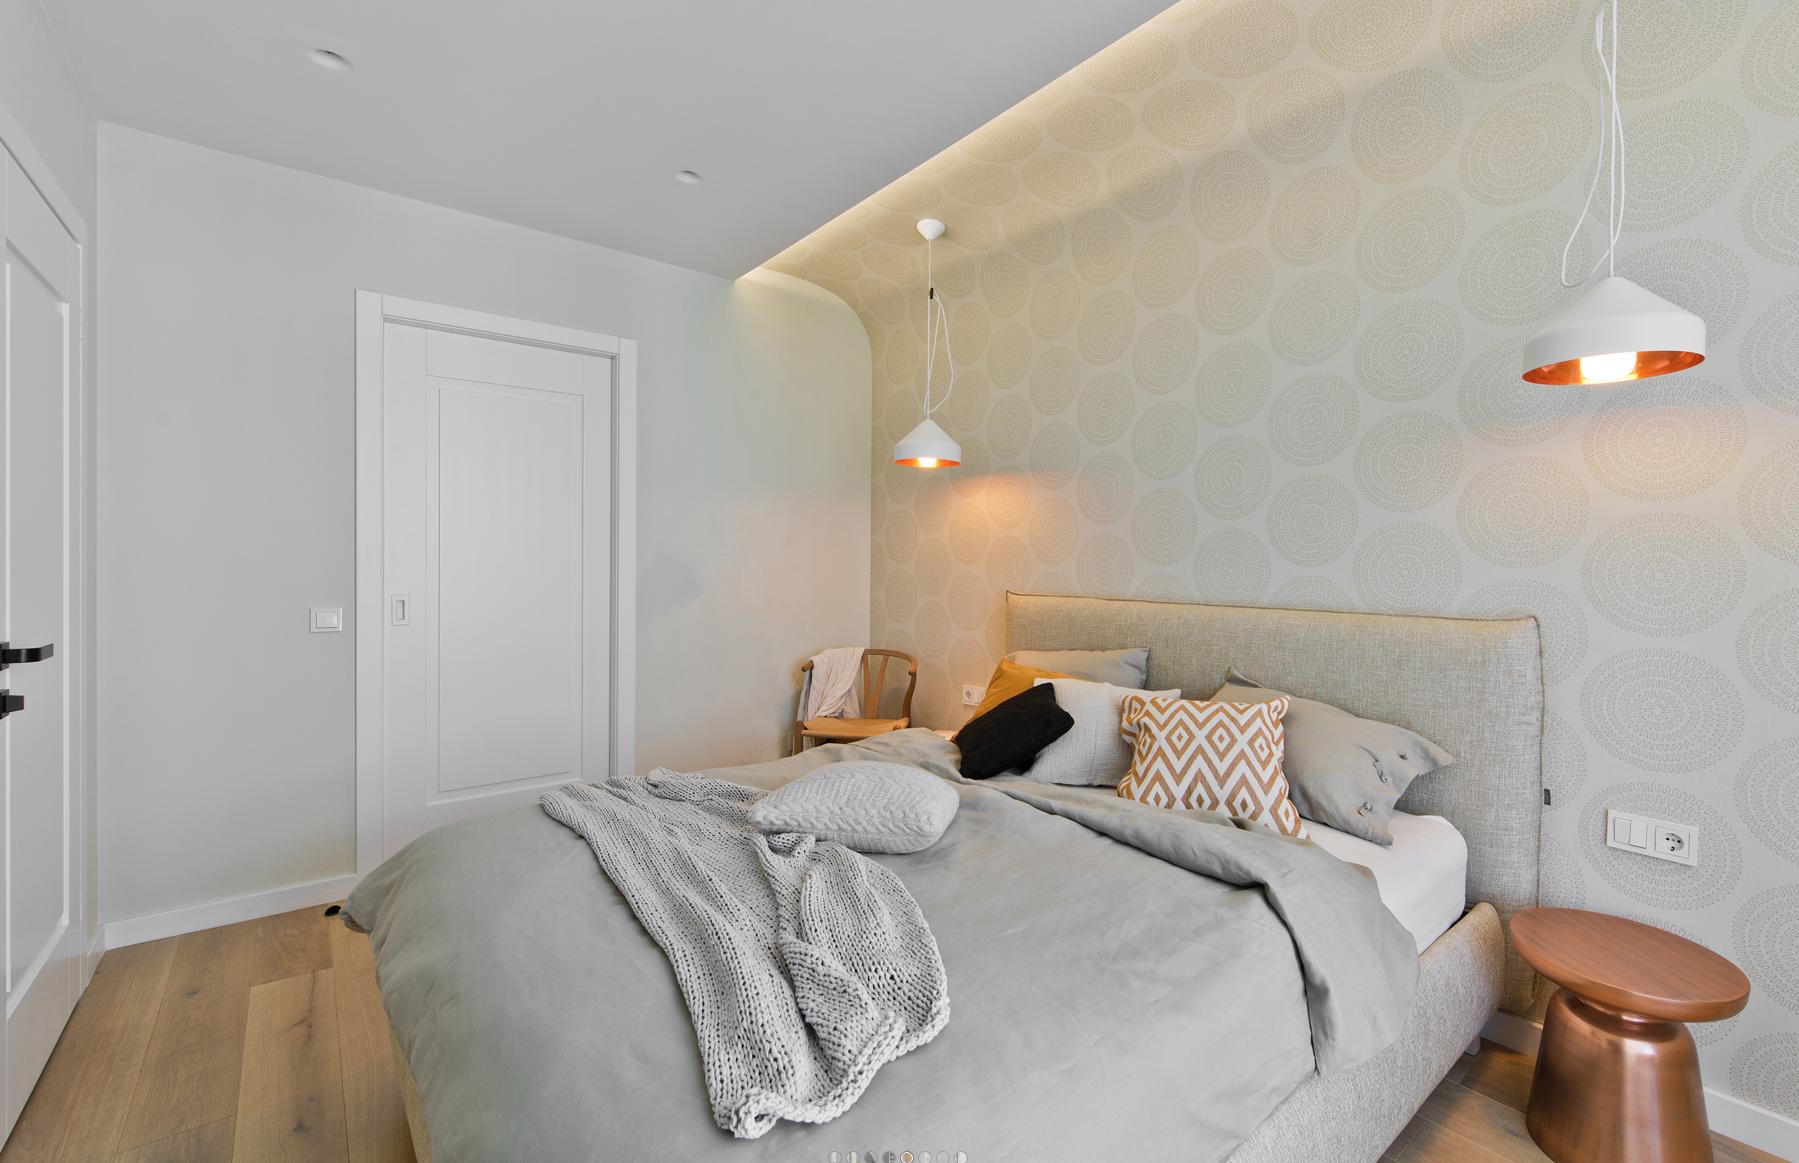 inarch apartment vilnius2 Apartments in Vilnius by Inarch